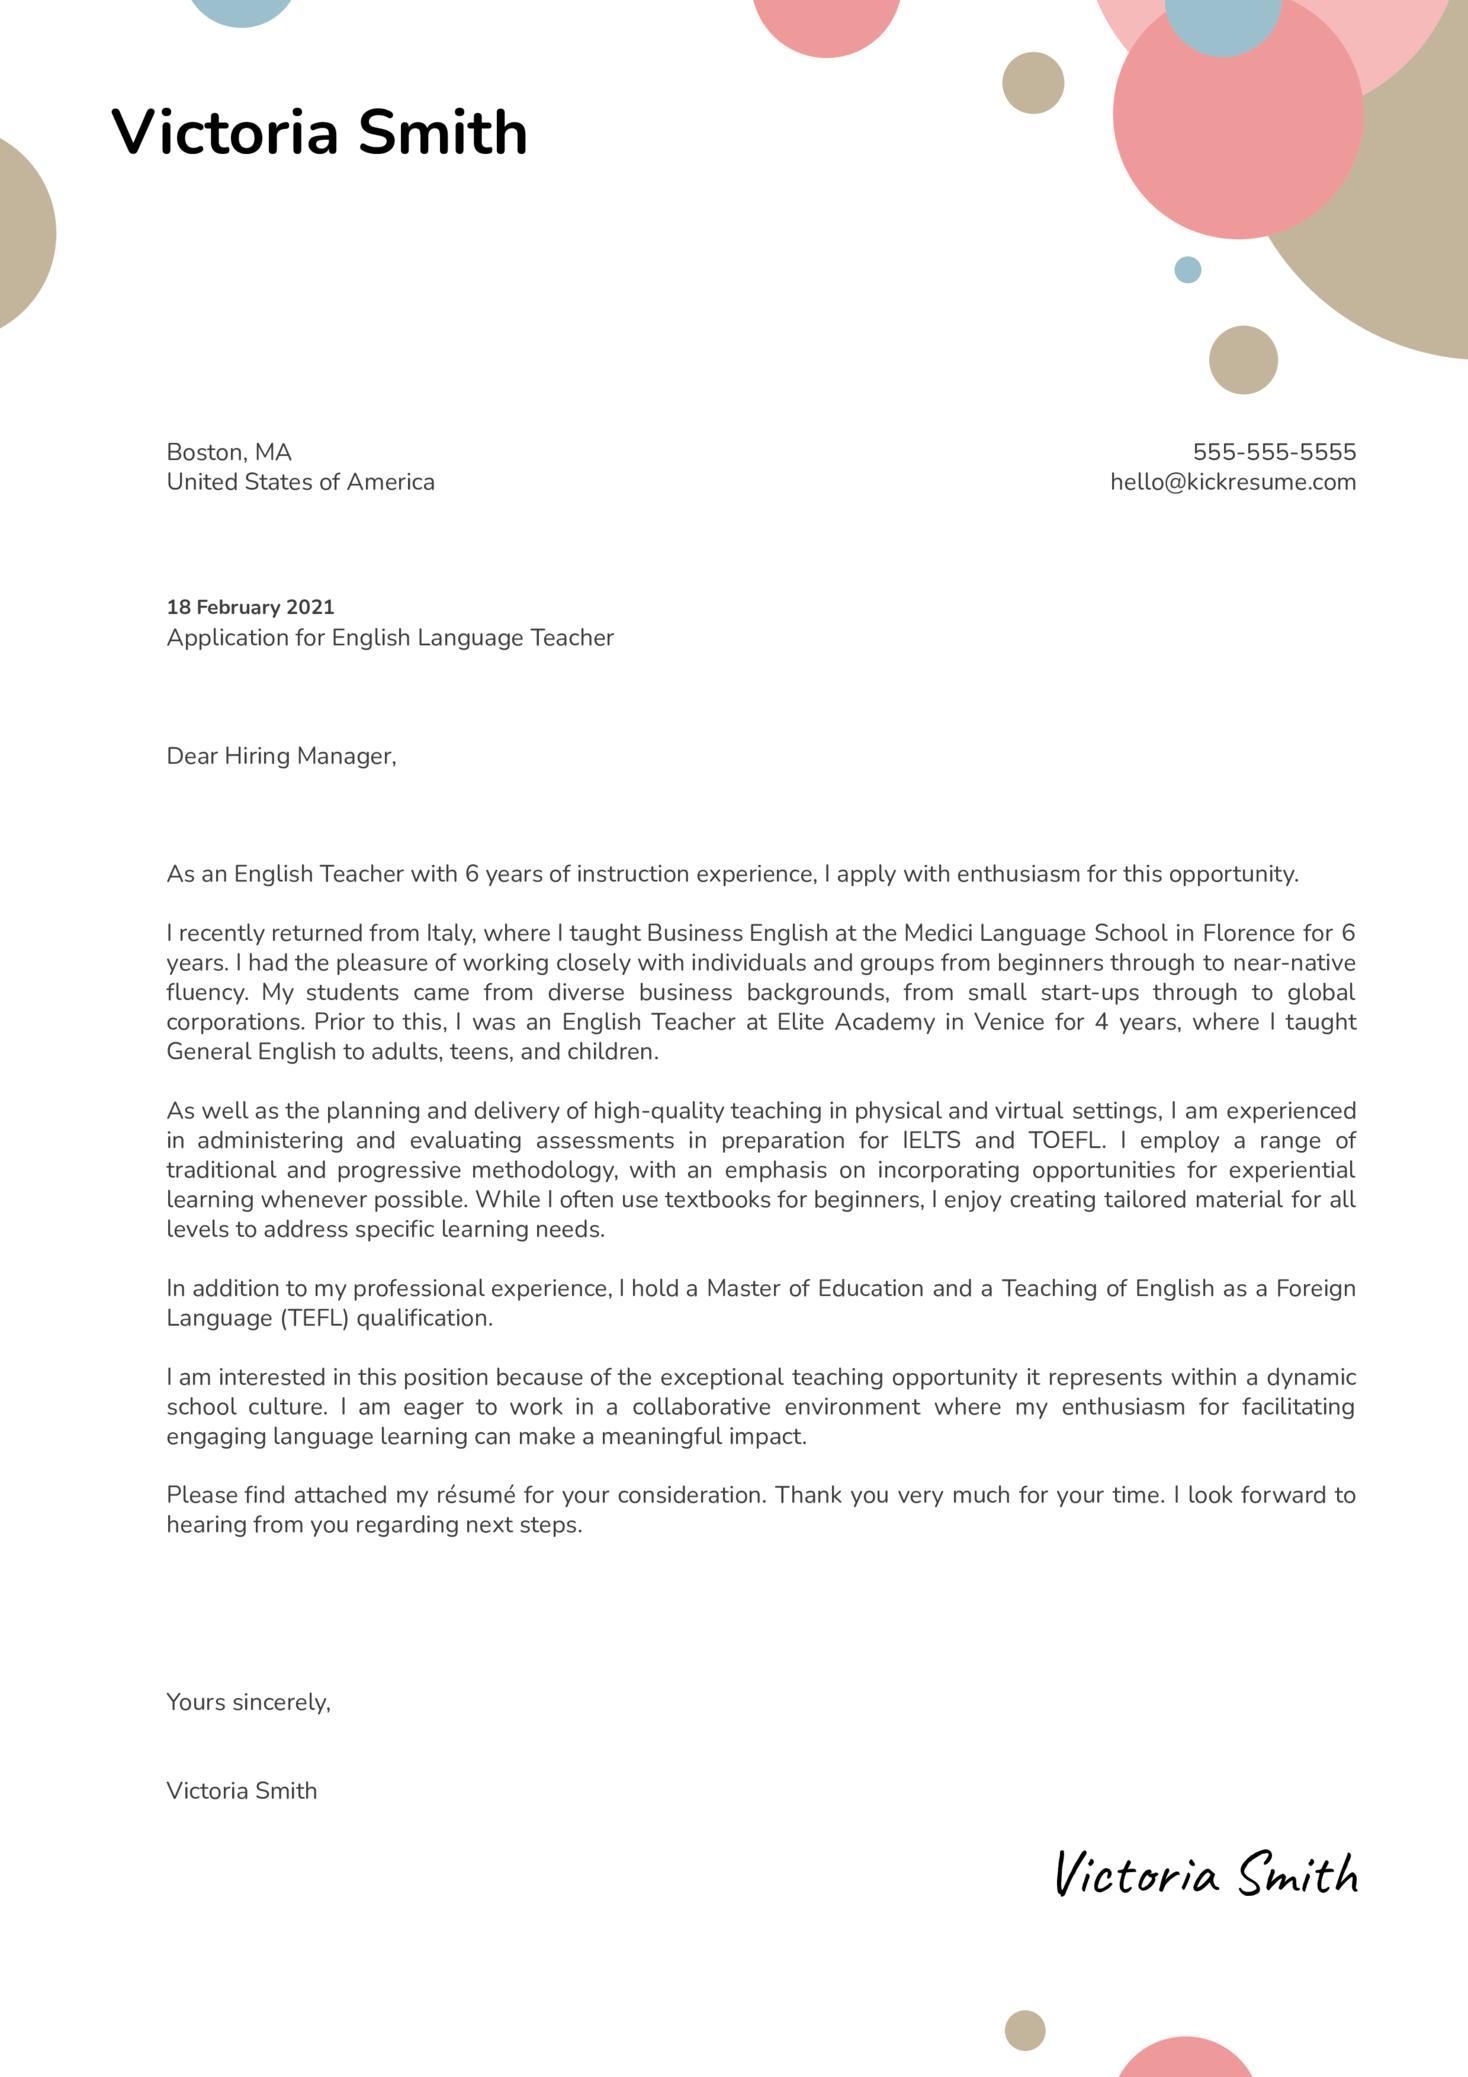 English Language Teacher Cover Letter Sample